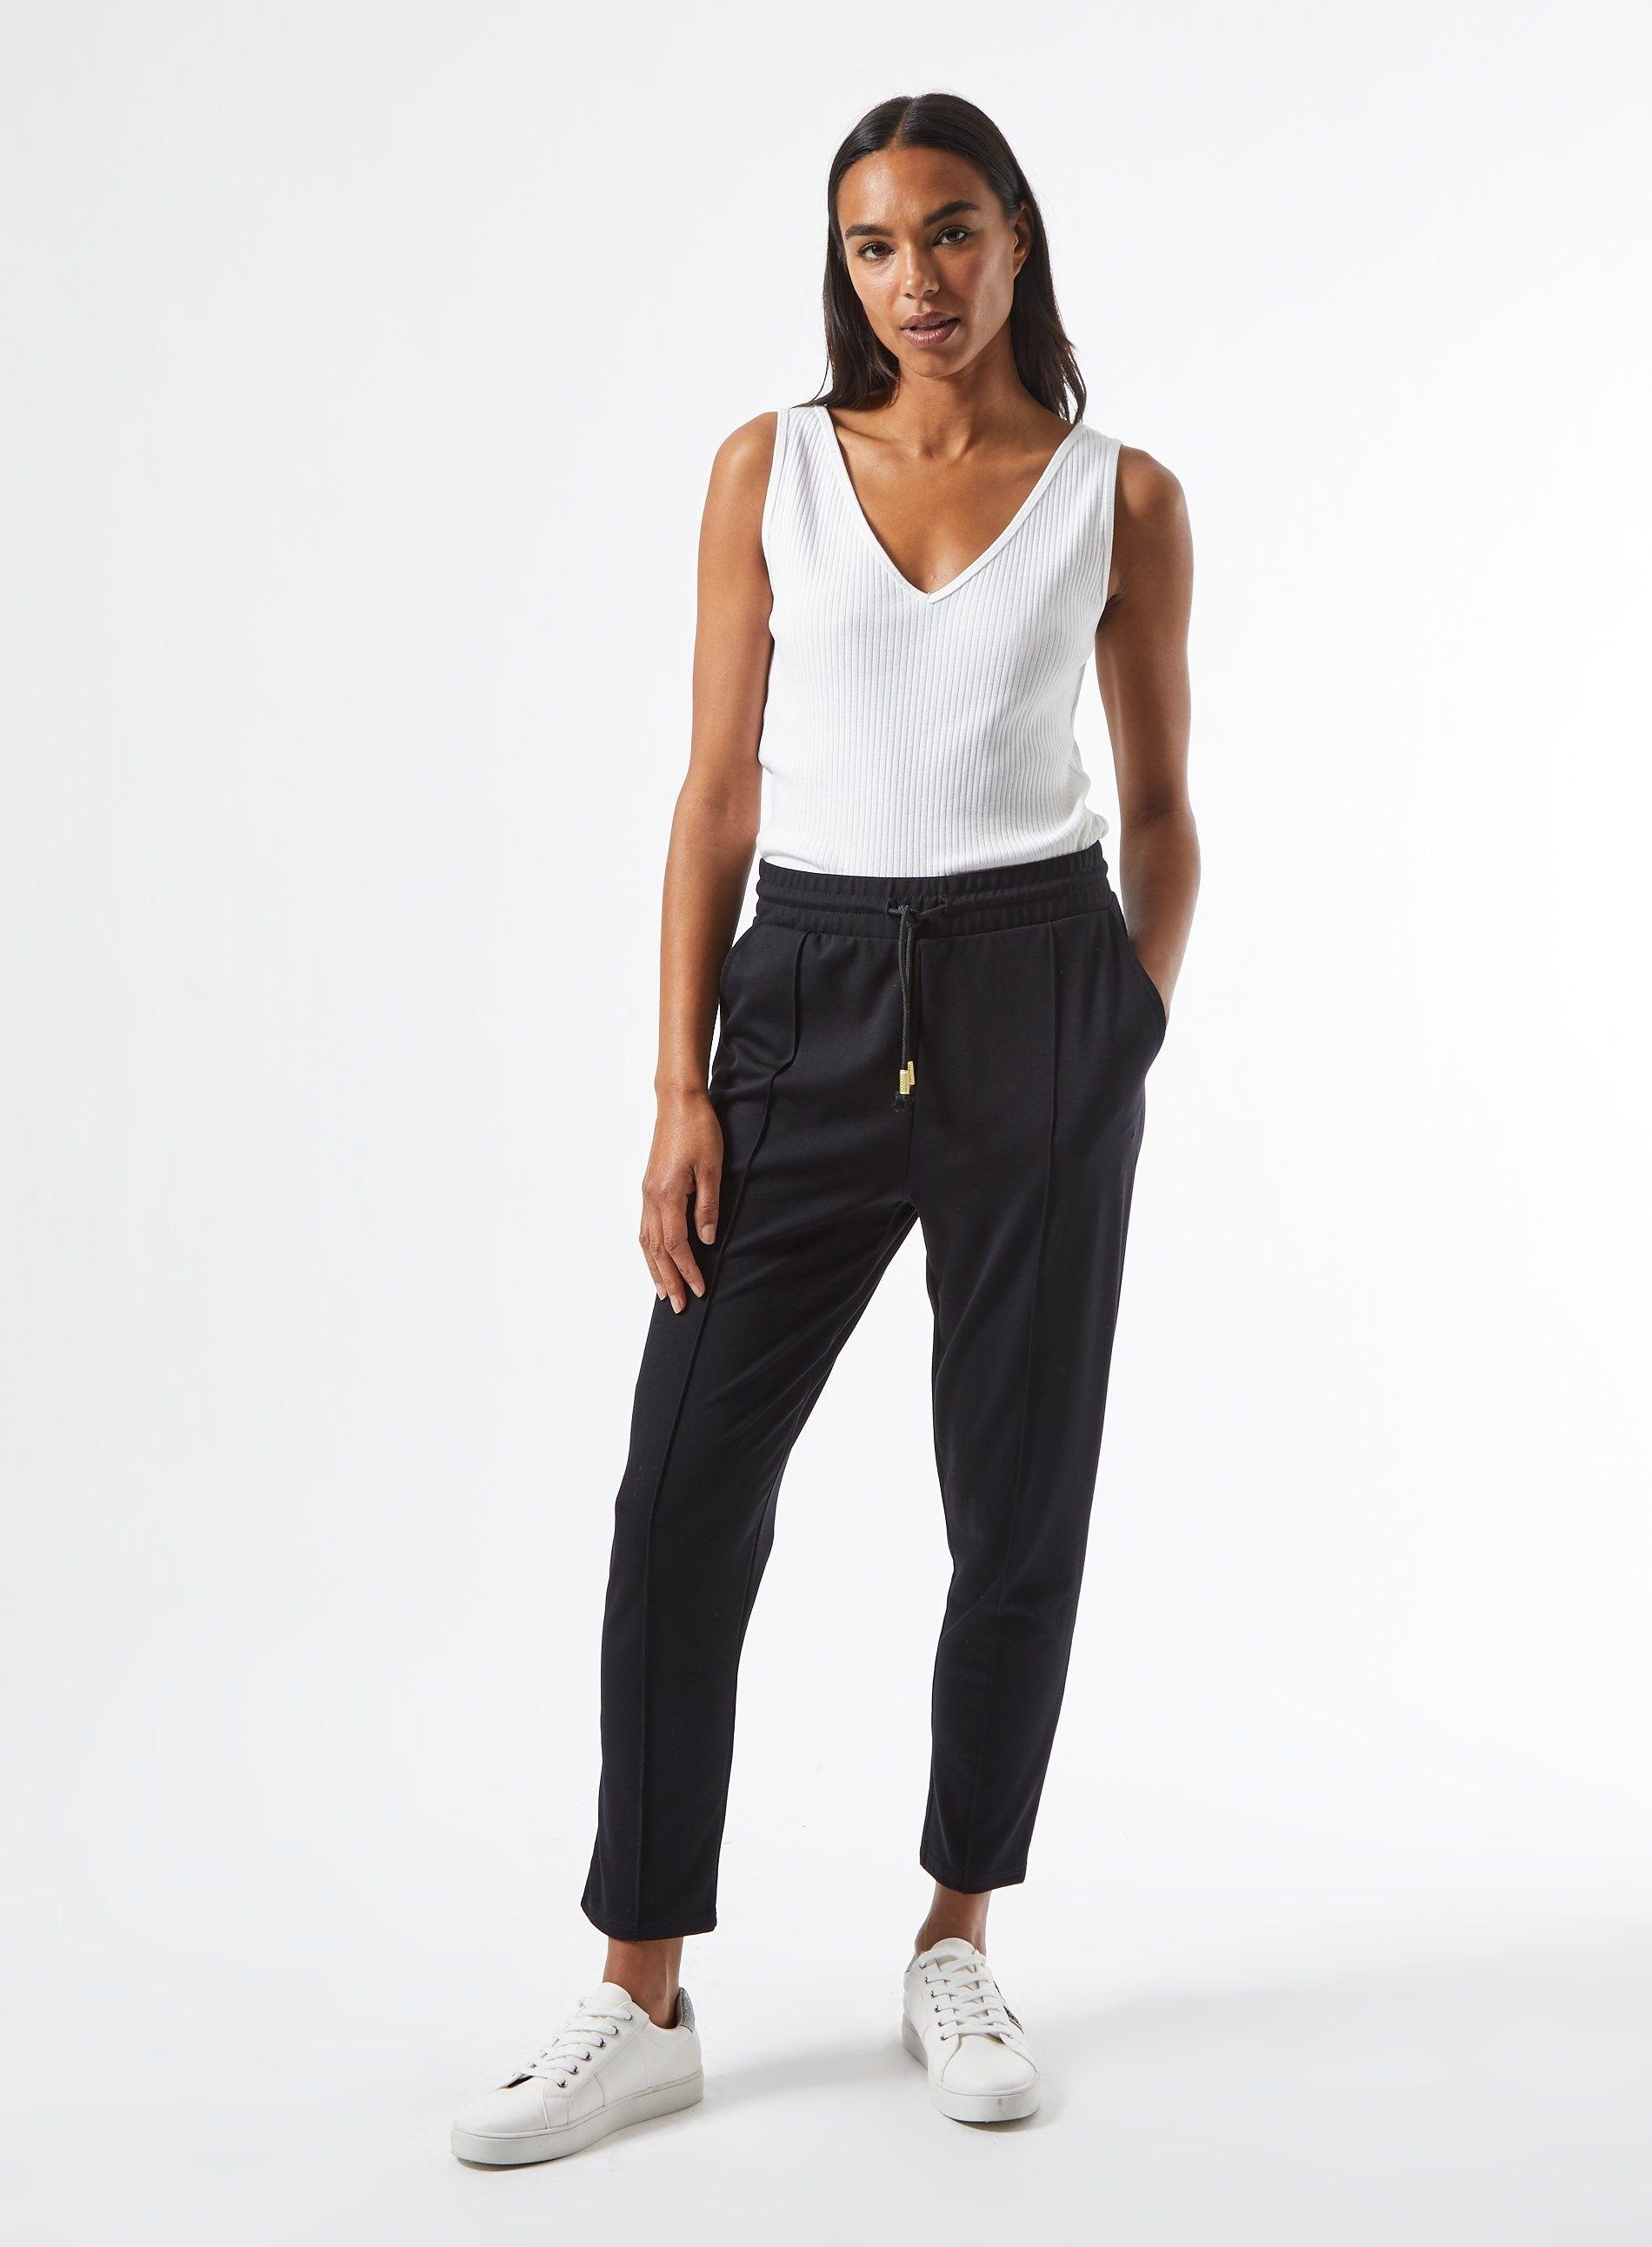 Dorothy Perkins Womens Black Ponte Tie Joggers Trousers Bottoms Sweatpants